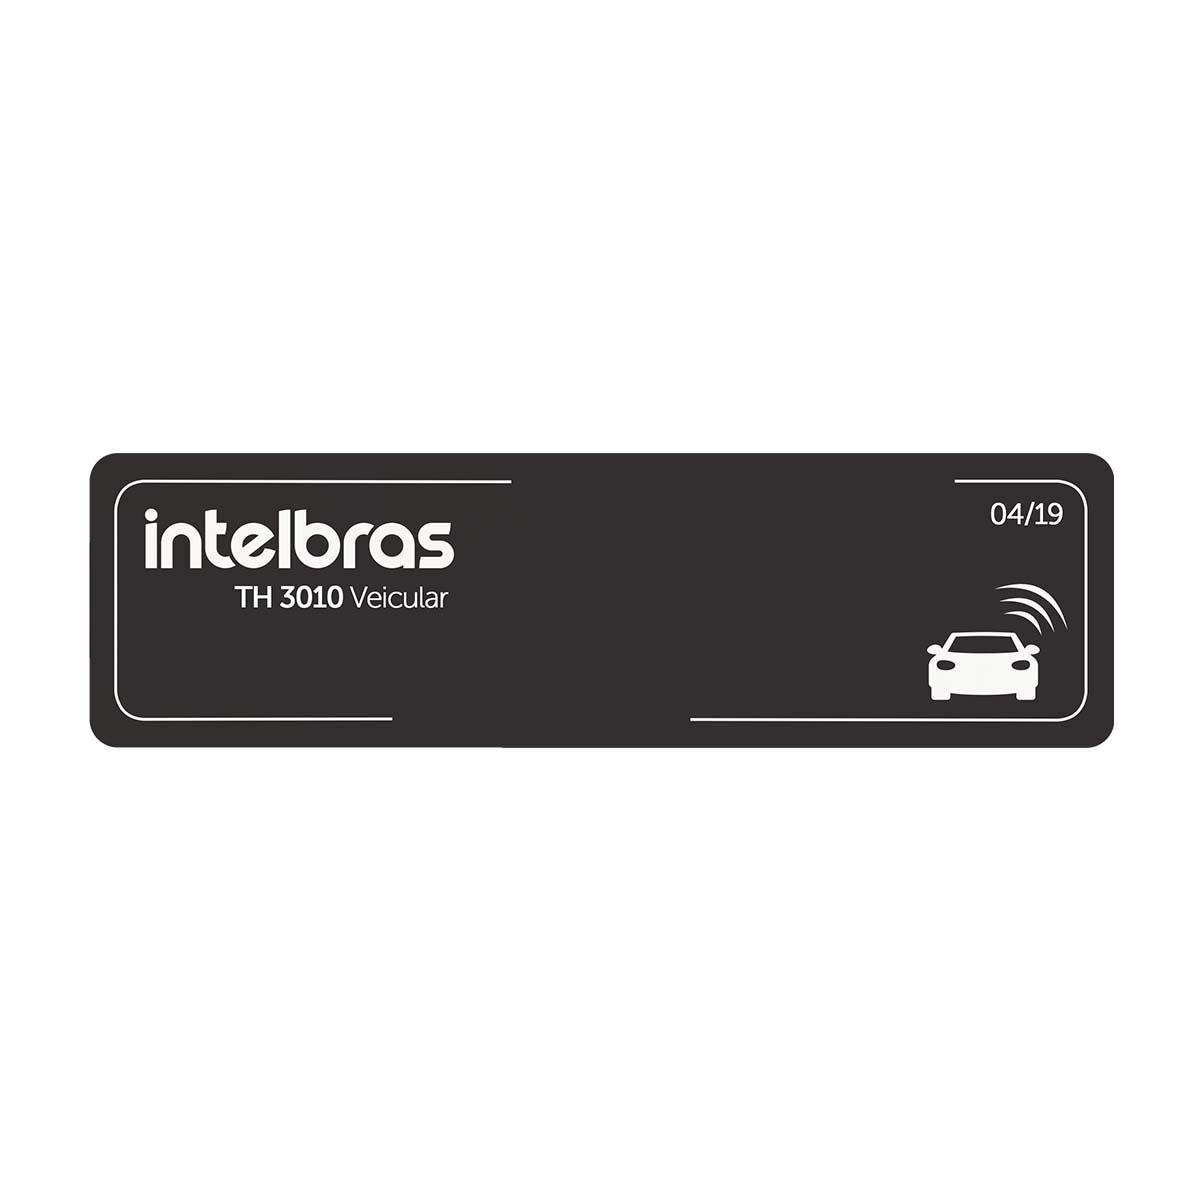 Kit 06 Etiqueta Veicular Intelbras Rfid 900mhz Th 3010